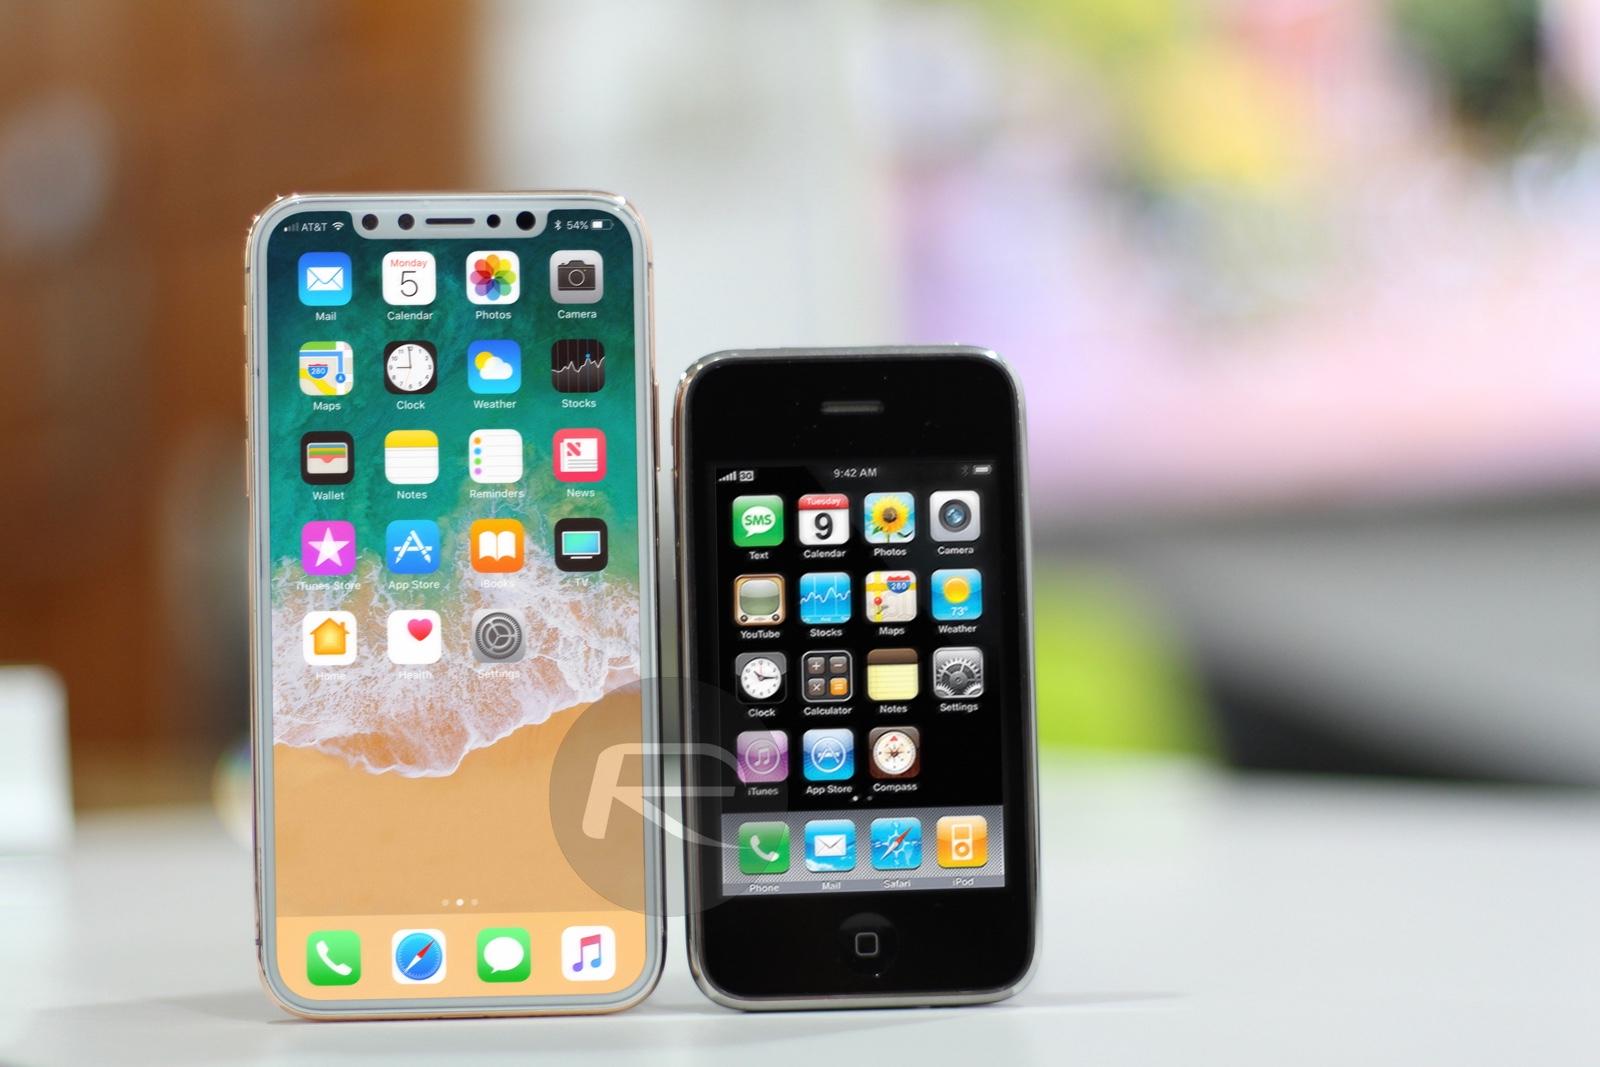 Iphone 5 vs iphone 8 größe